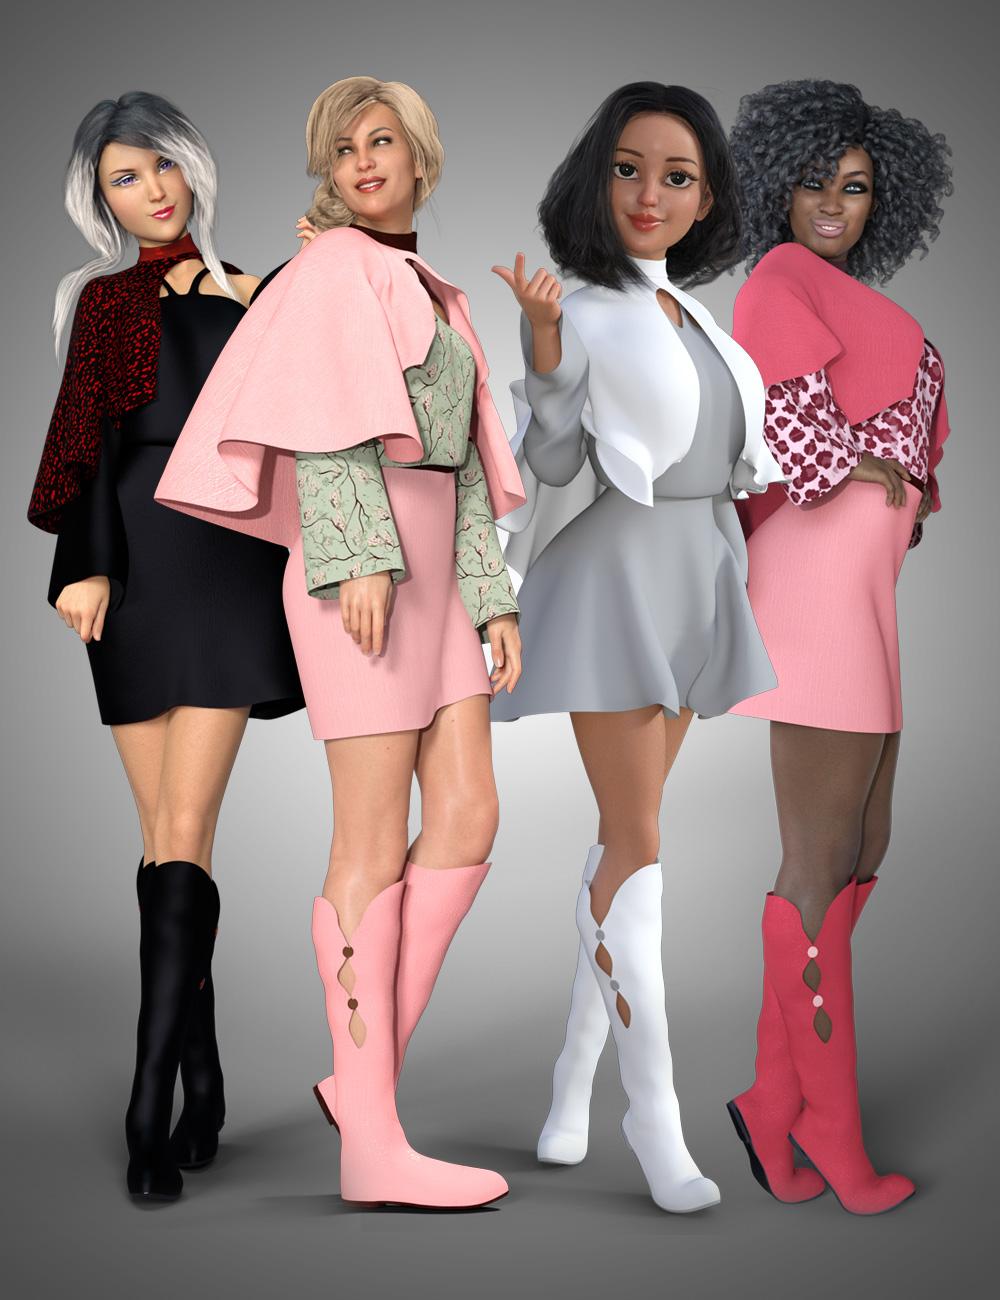 dForce Cape Dress for Genesis 8 Female by: PoisenedLily, 3D Models by Daz 3D